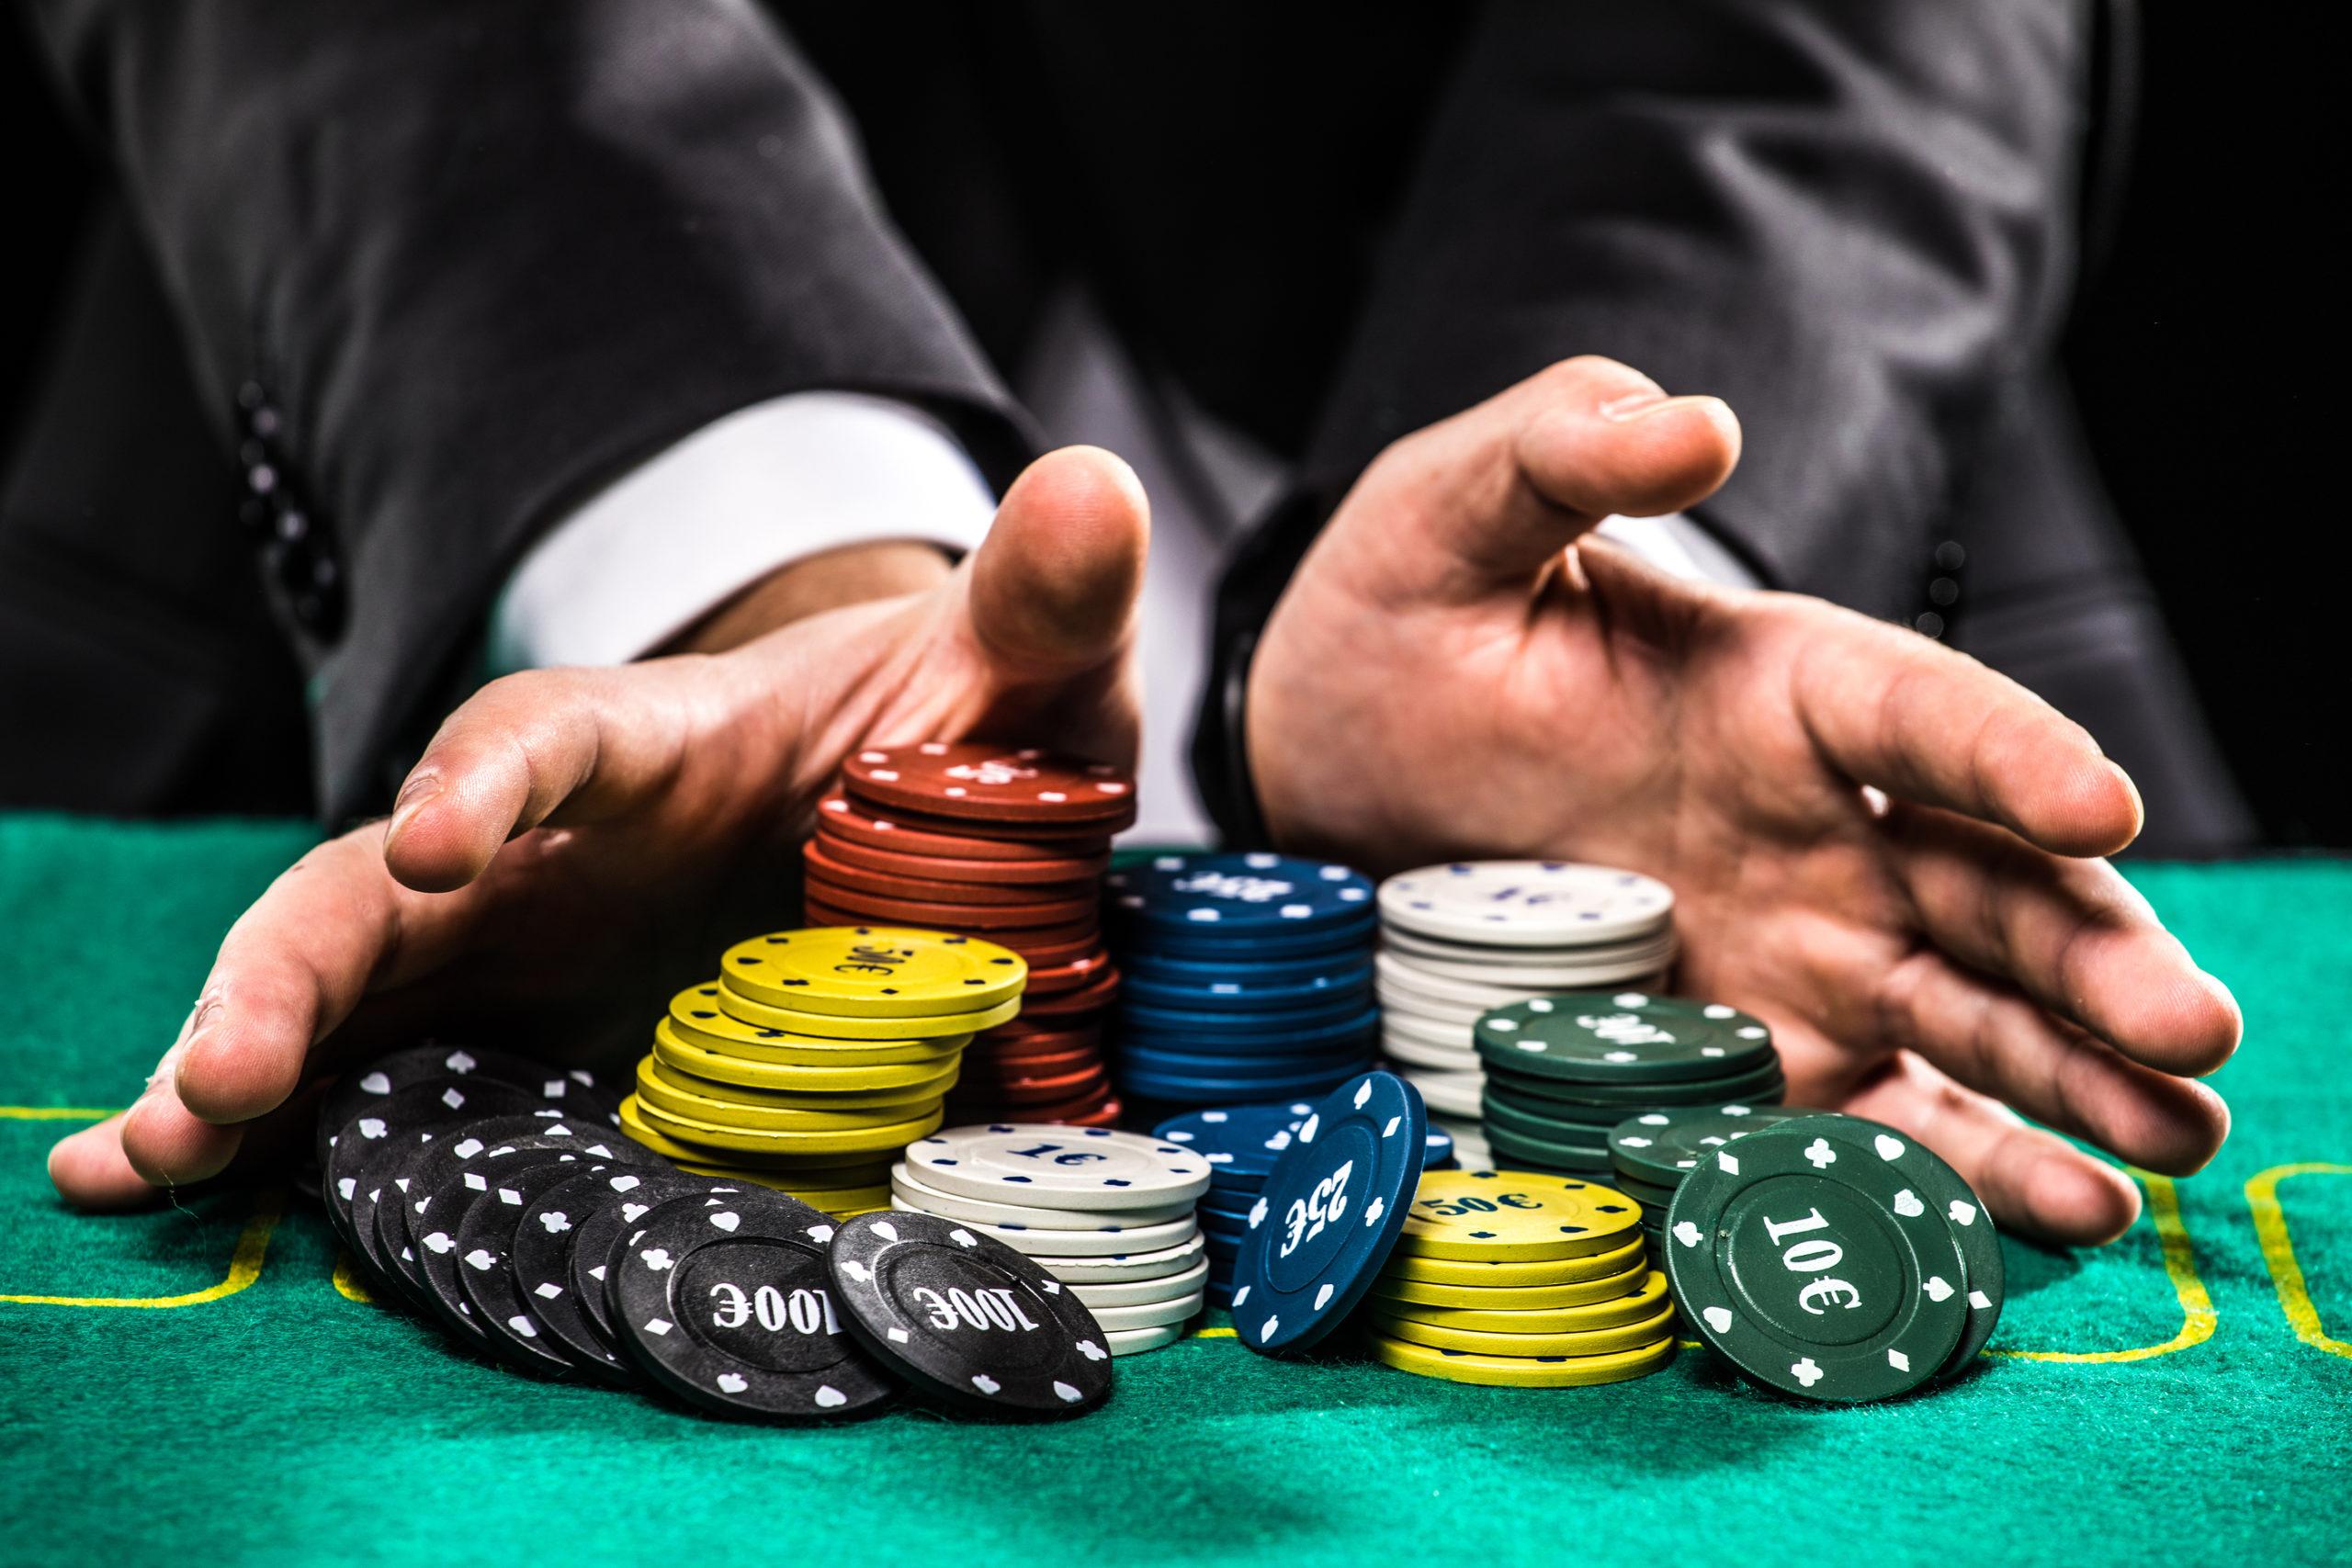 Playing Poker Online Games